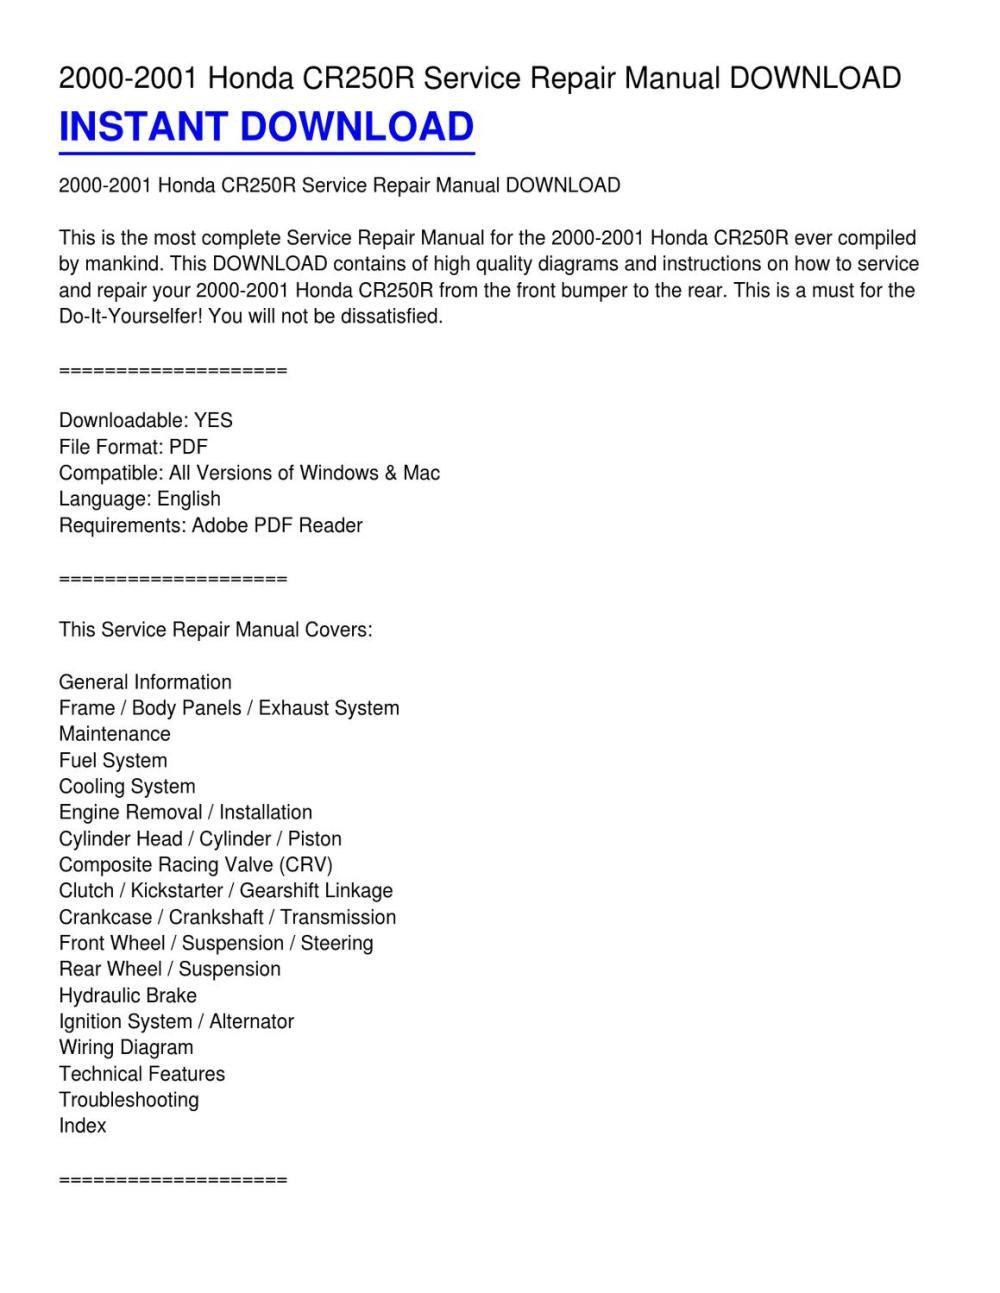 medium resolution of 2000 2001 honda cr250r service repair manual download by gloria calhoun issuu